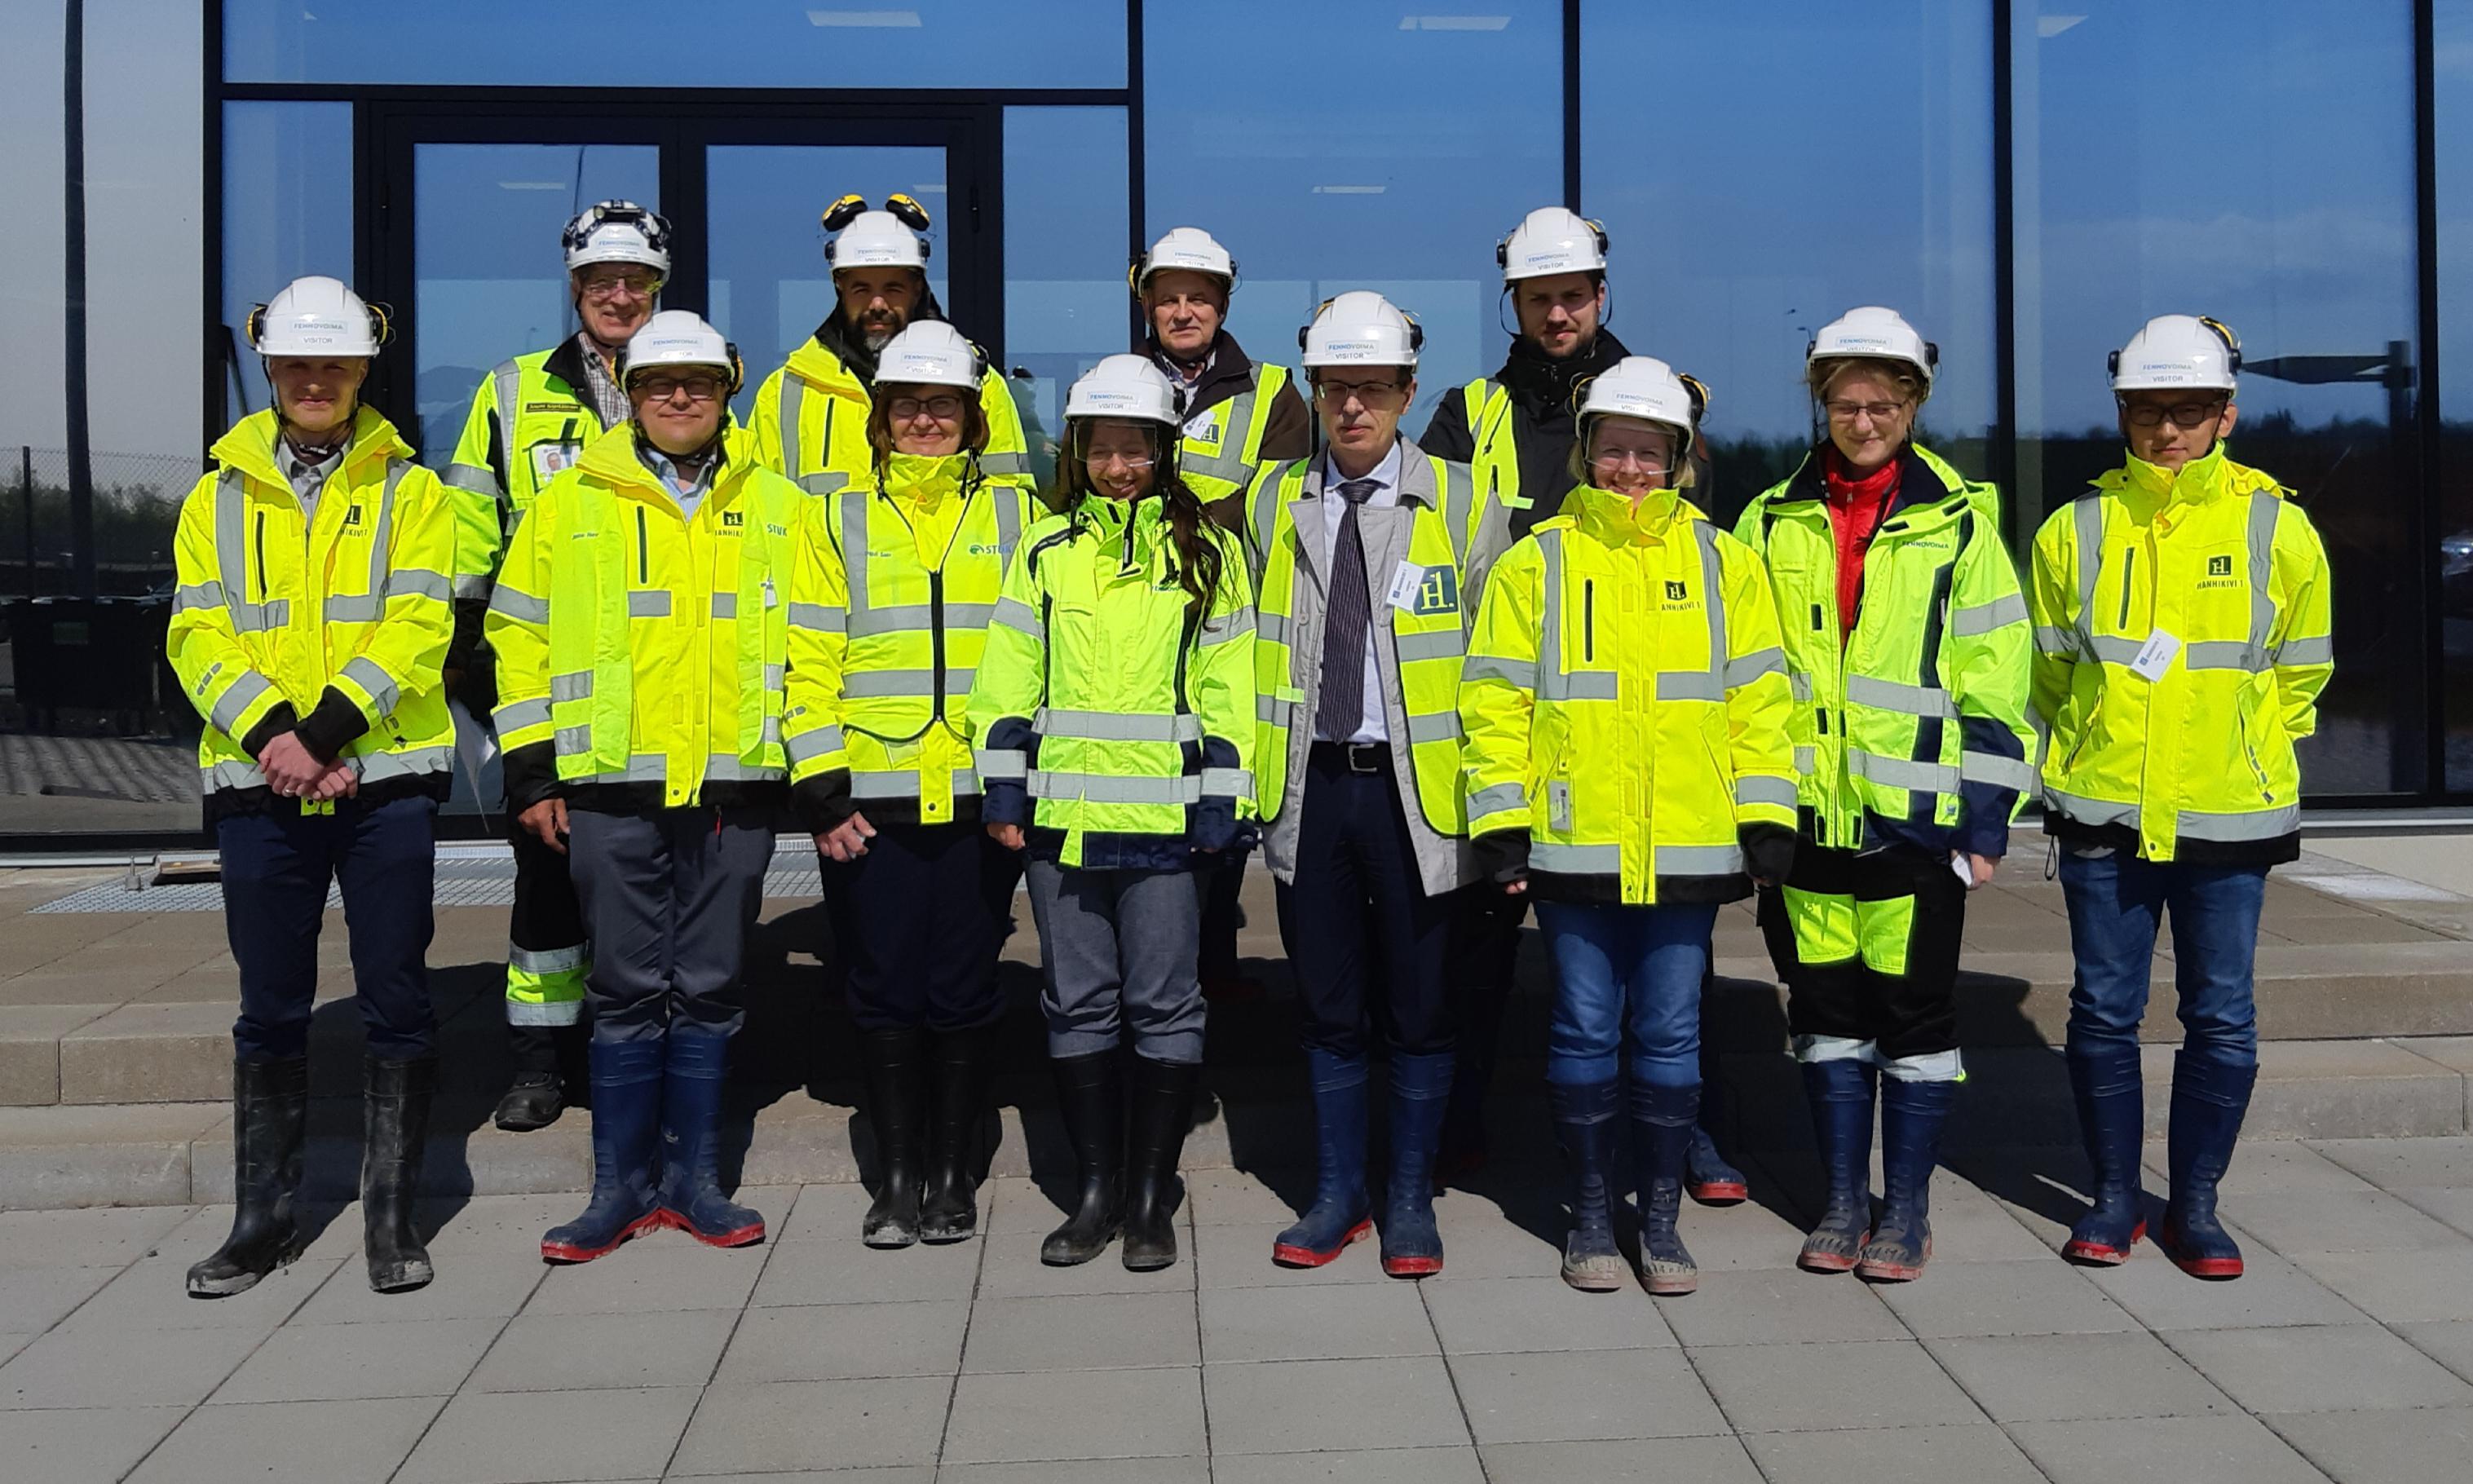 MDEP VVERWG visits the Hanhikivi 1 construction site, May 2019